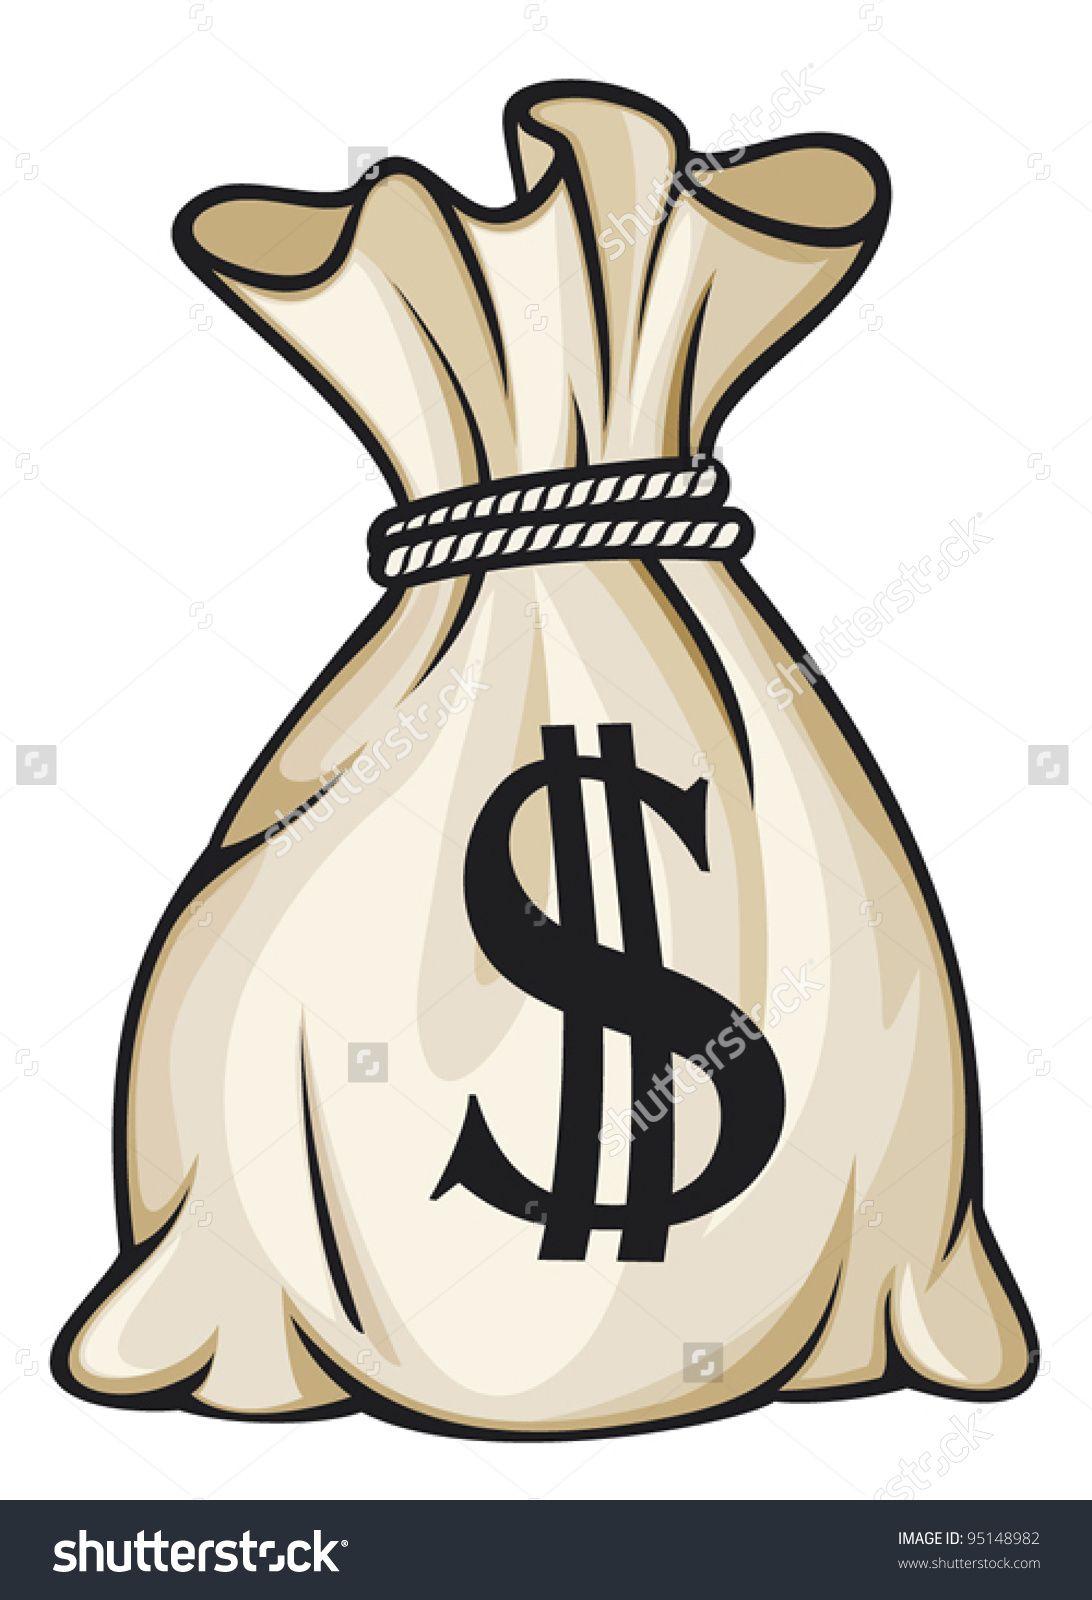 Money Bag With Dollar Sign Money Bag Tattoo Money Tattoo Dollar Sign Tattoo